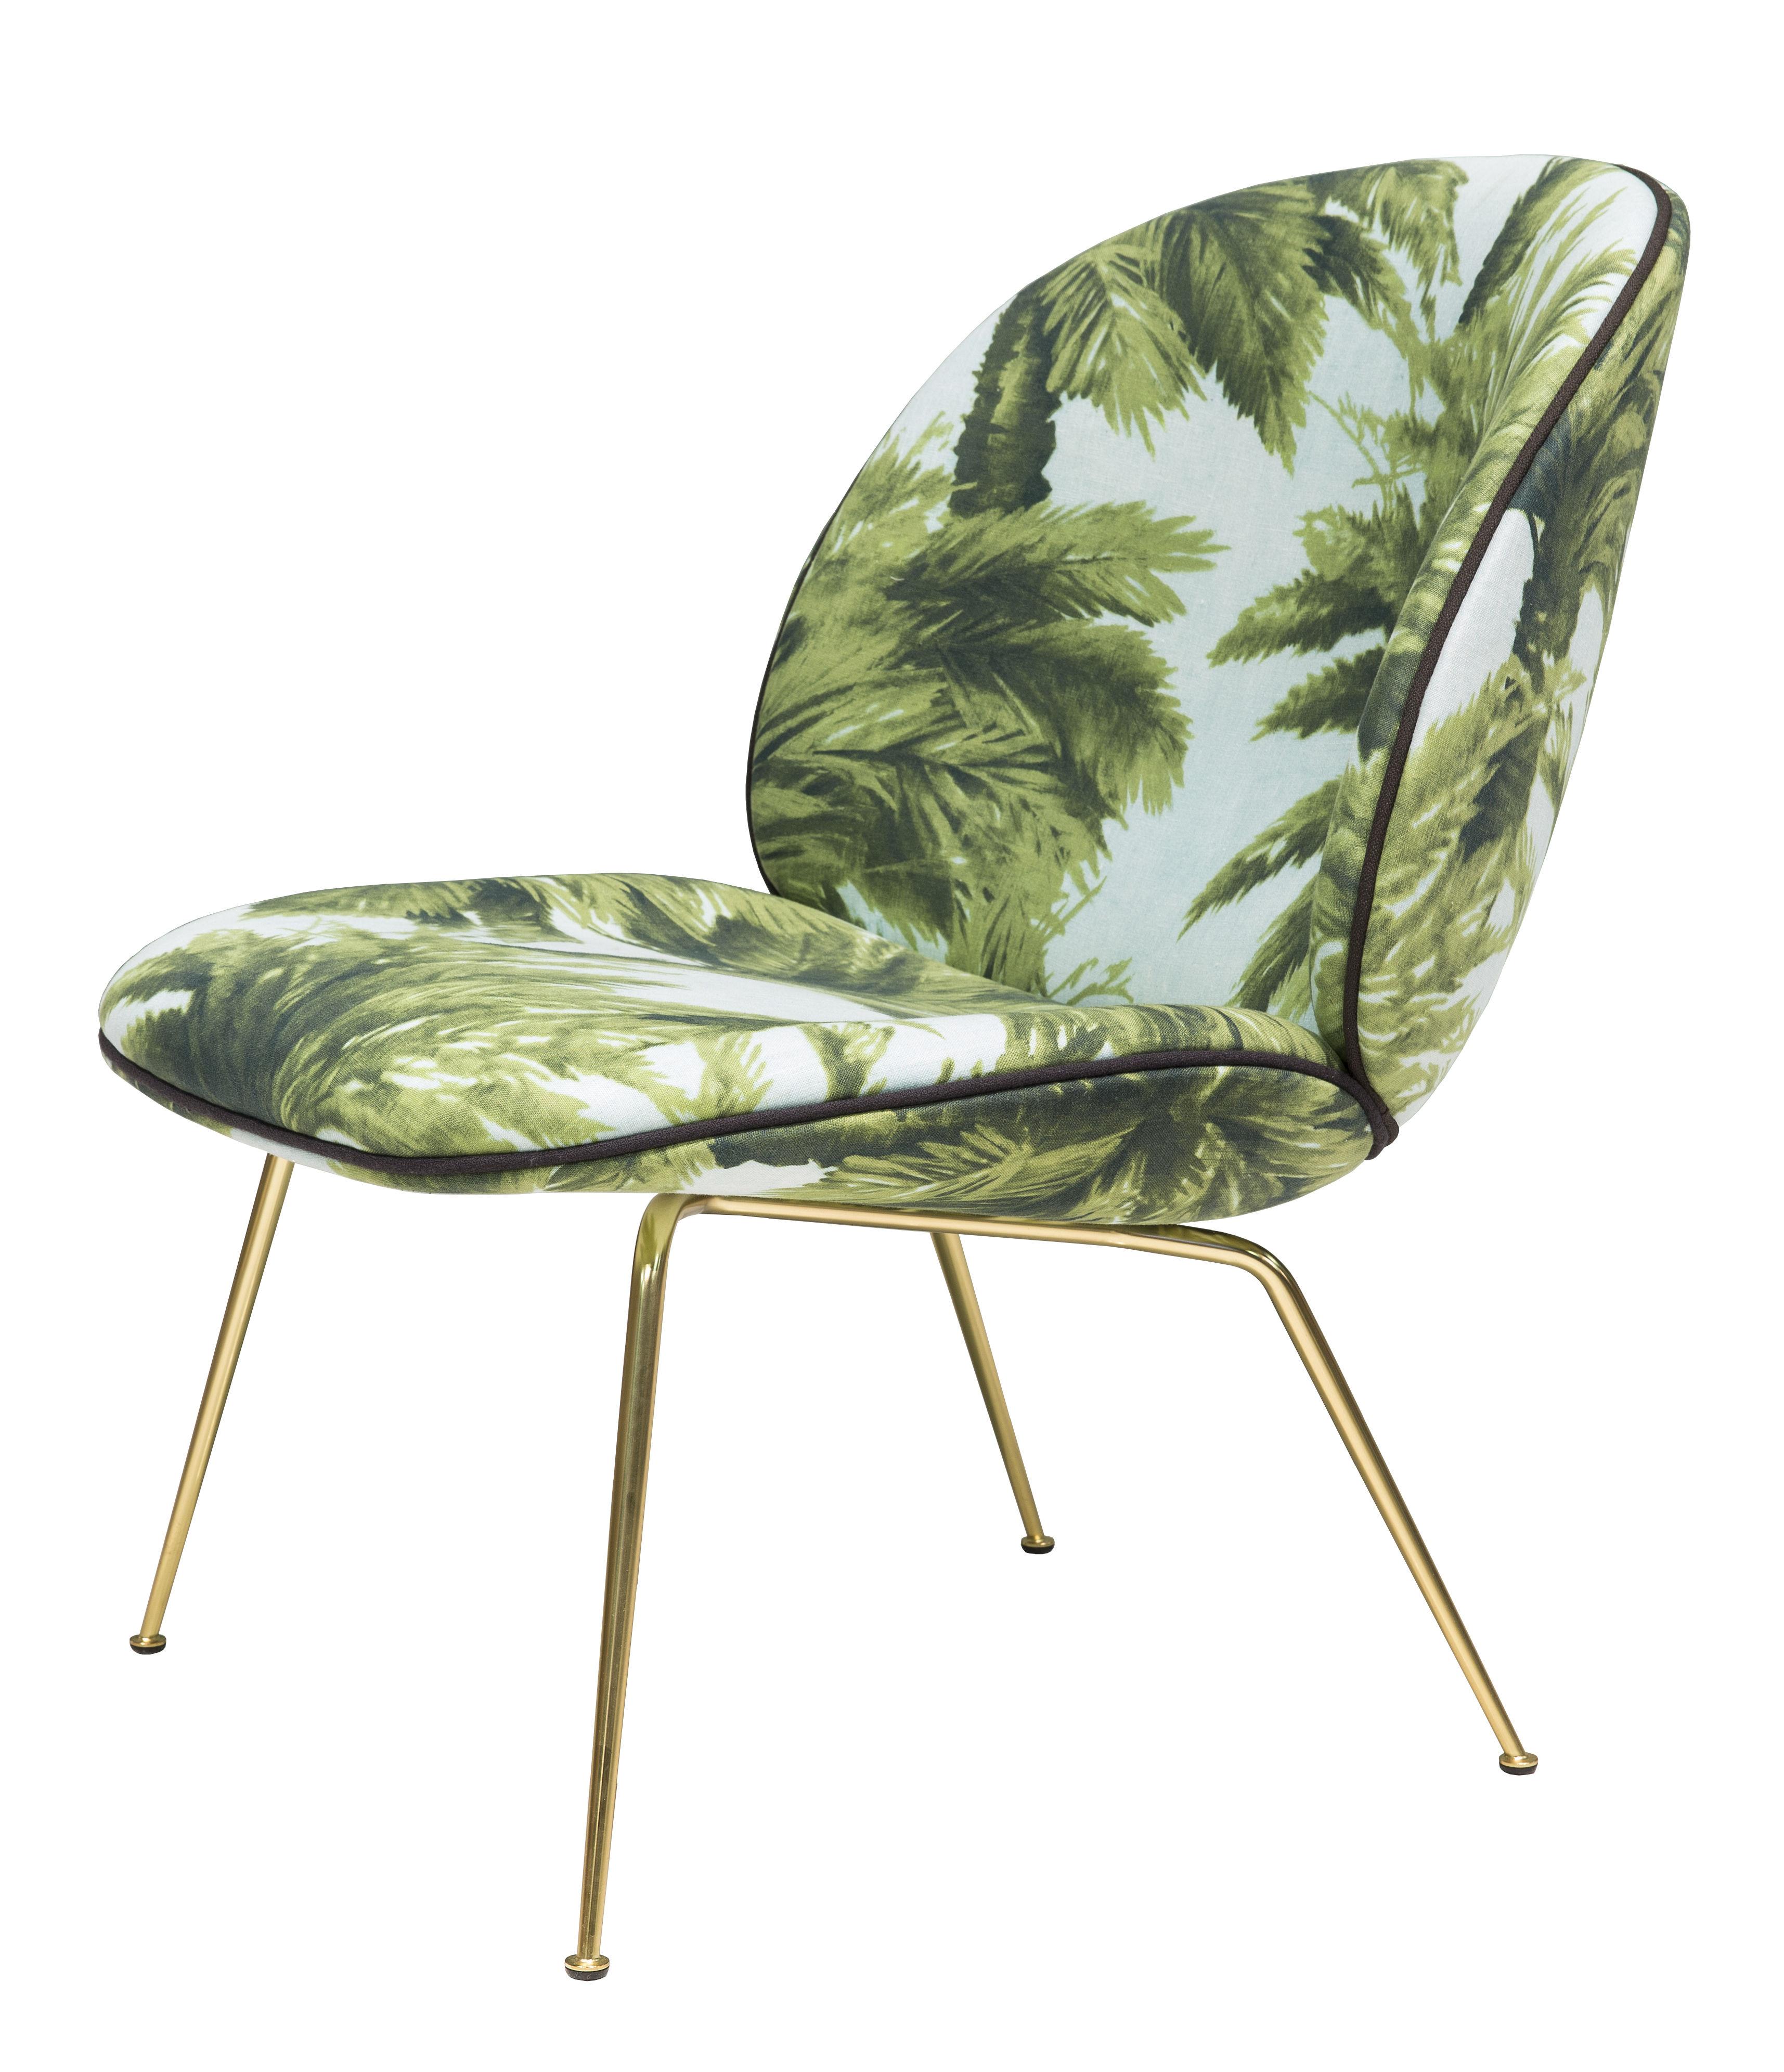 Möbel - Lounge Sessel - Beetle Lounge Sessel / Gamfratesi - Stoffbezug - Gubi - Grünes Palmenmotiv auf blauem Grund  / Stuhlbeine: Messing - Acier plaqué laiton, Gewebe, Schaumstoff